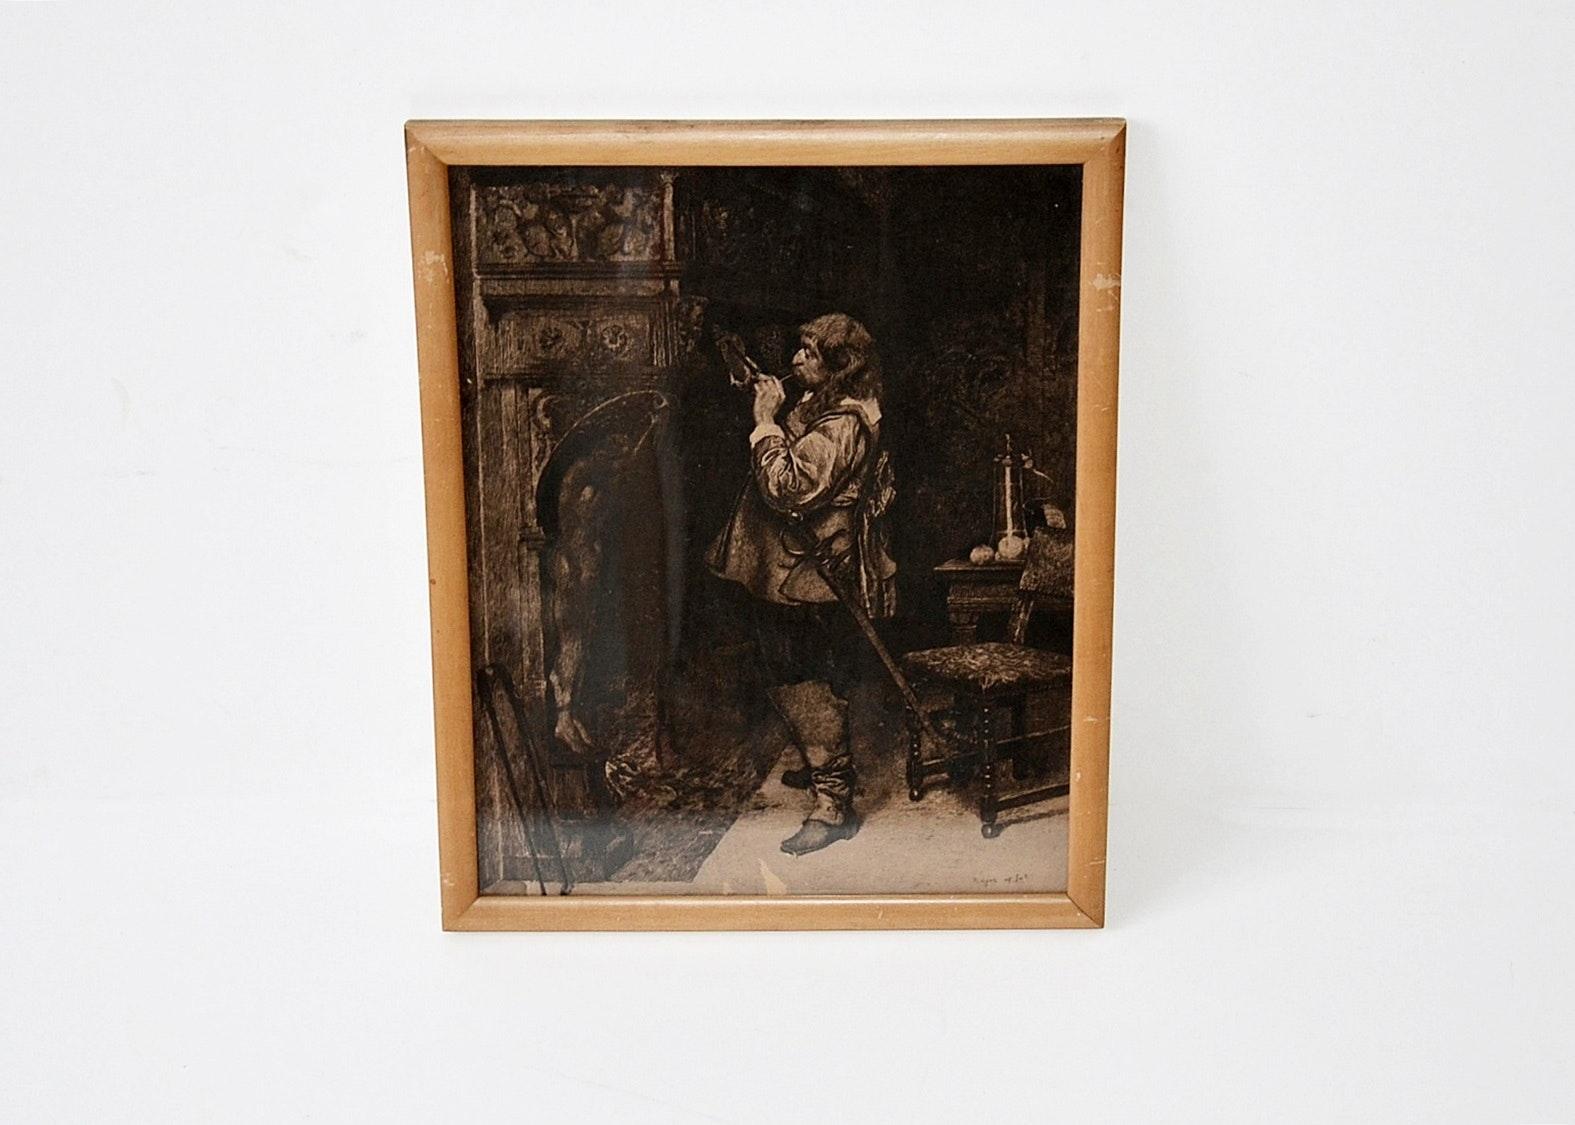 Etching by Paul-Adolphe Rajon.